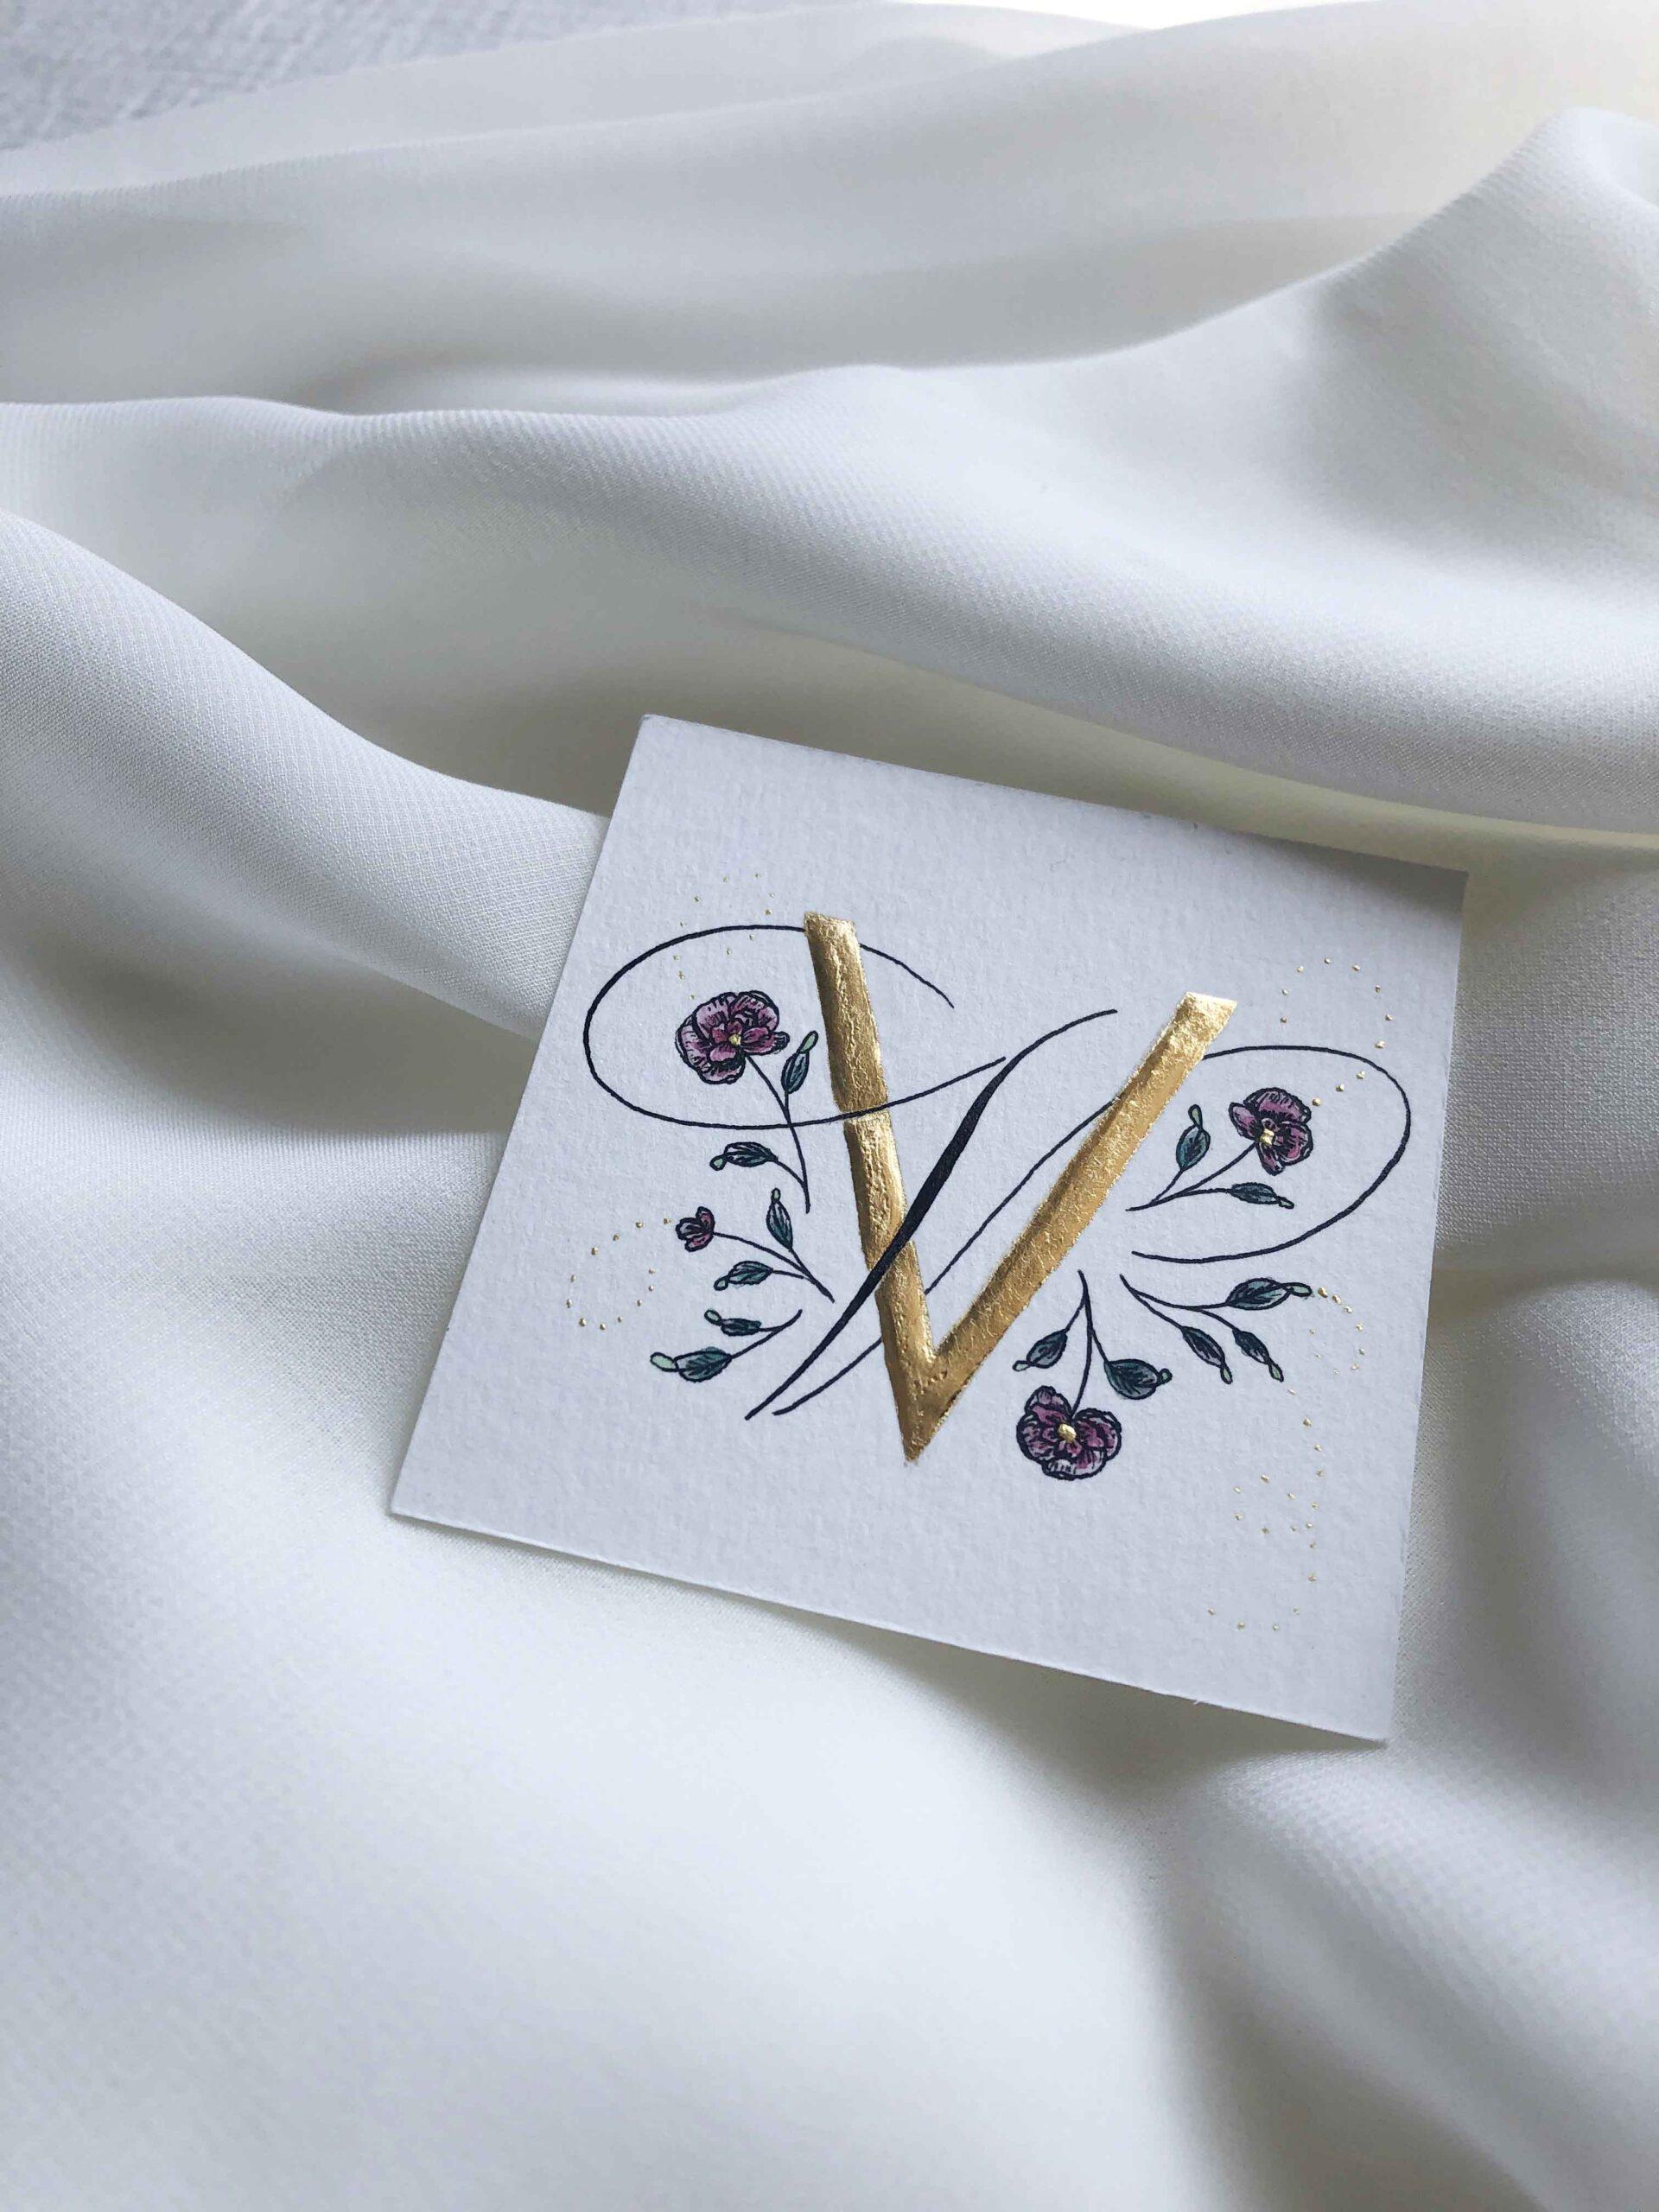 Allocco Design Norfolk, VA Calligraphy | Flourished Gold Calligraphy V